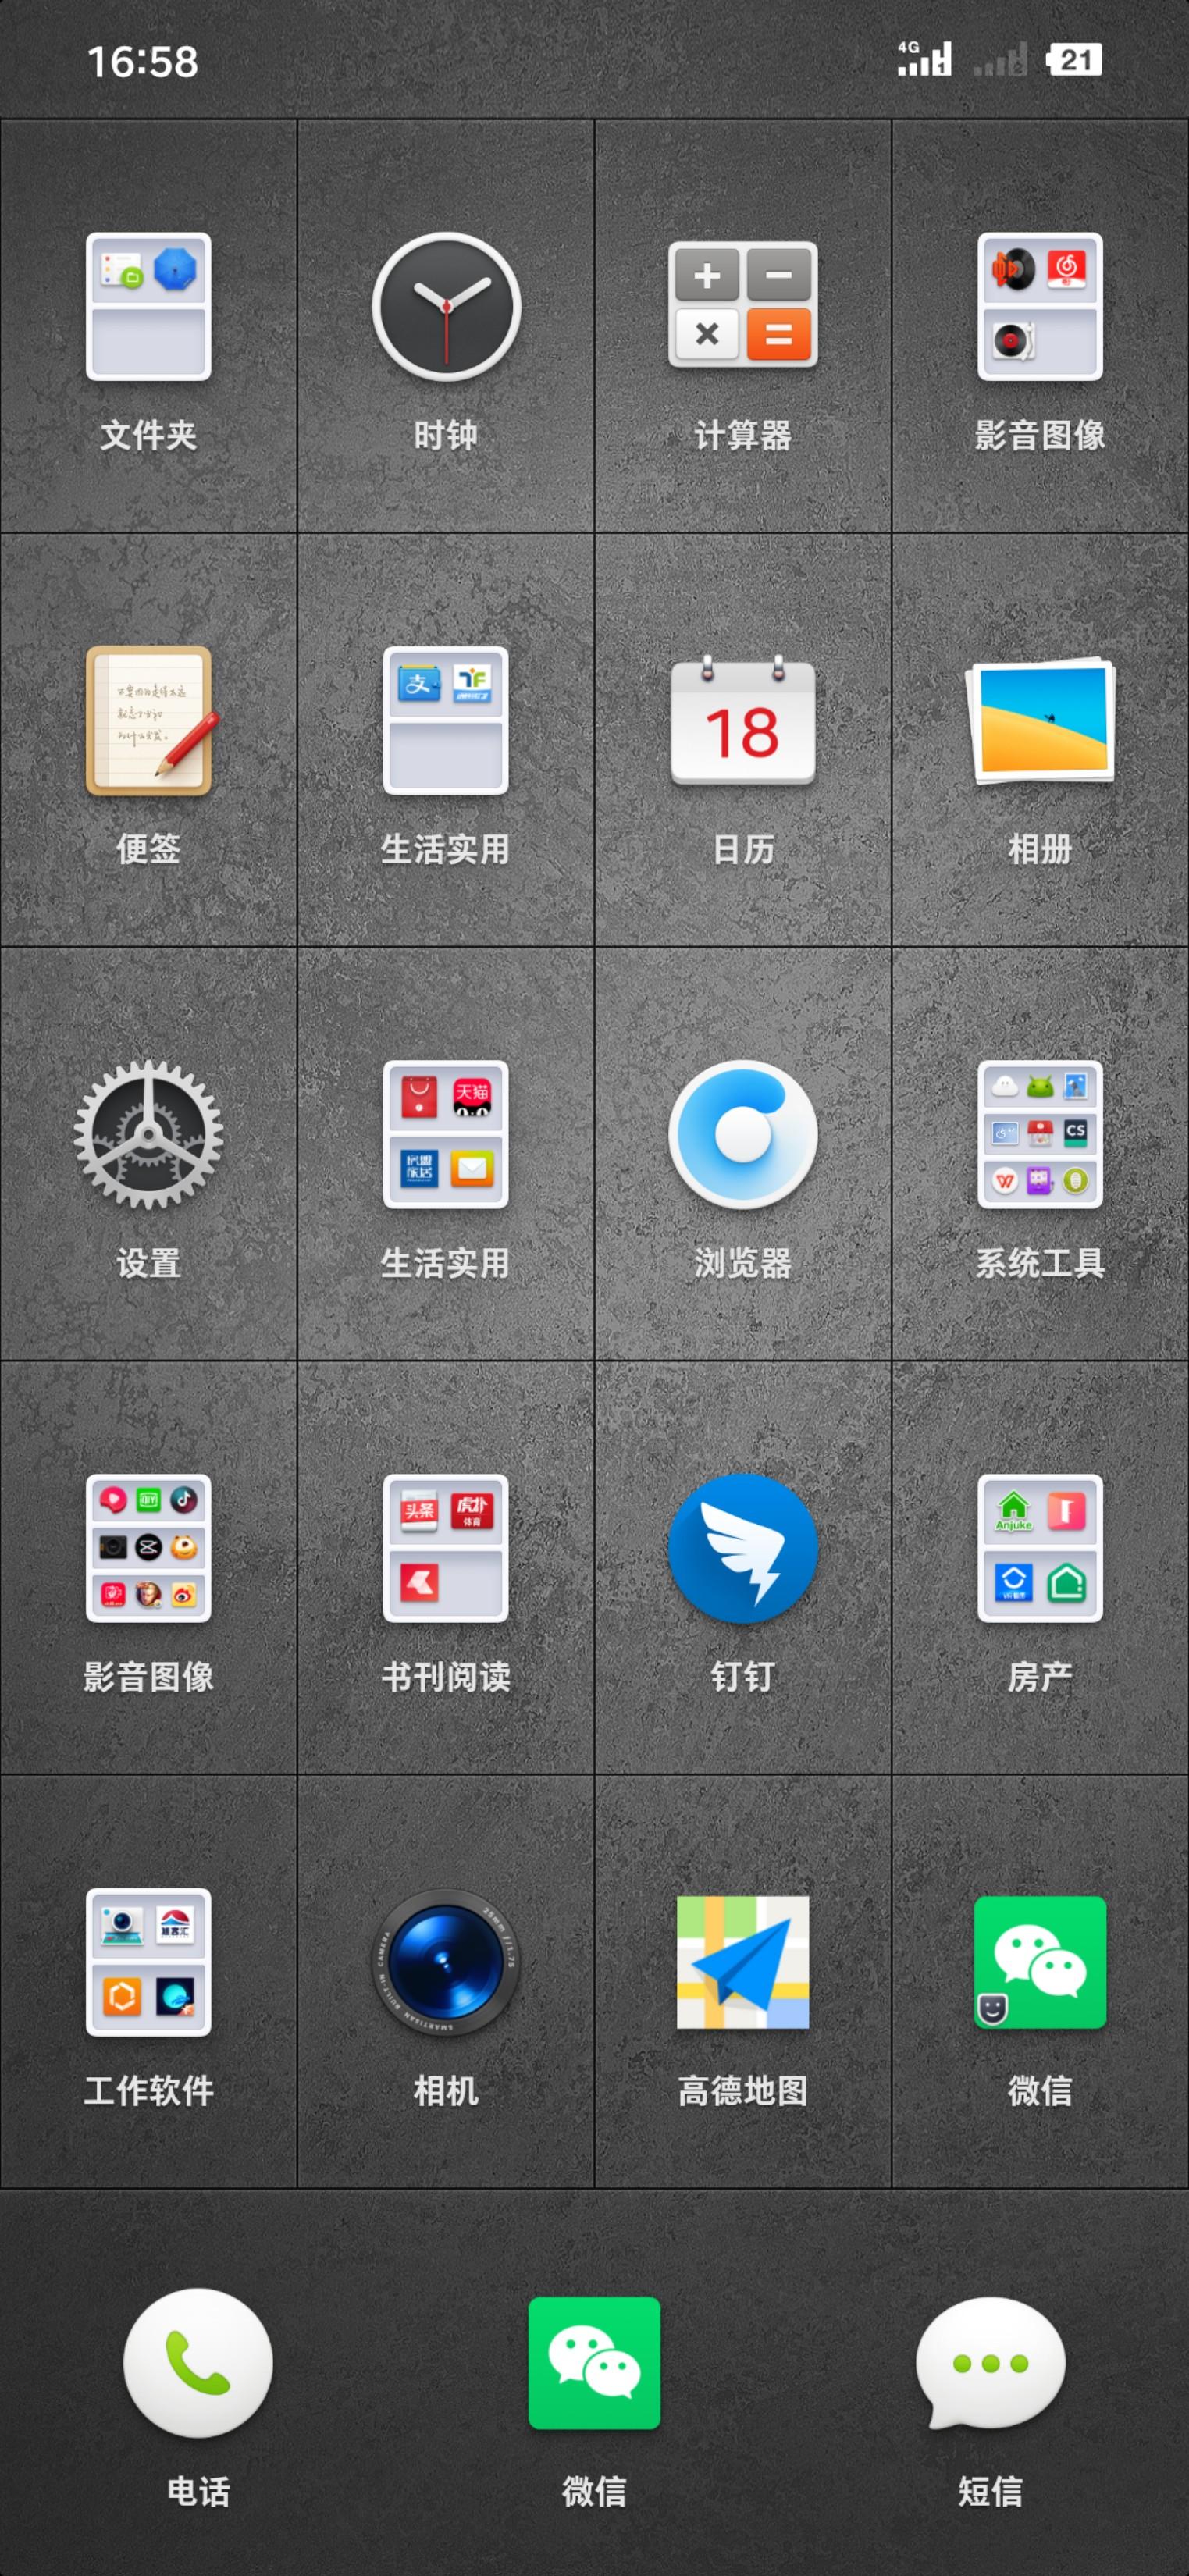 Screenshot_2020-04-18-16-59-00-400_??.png